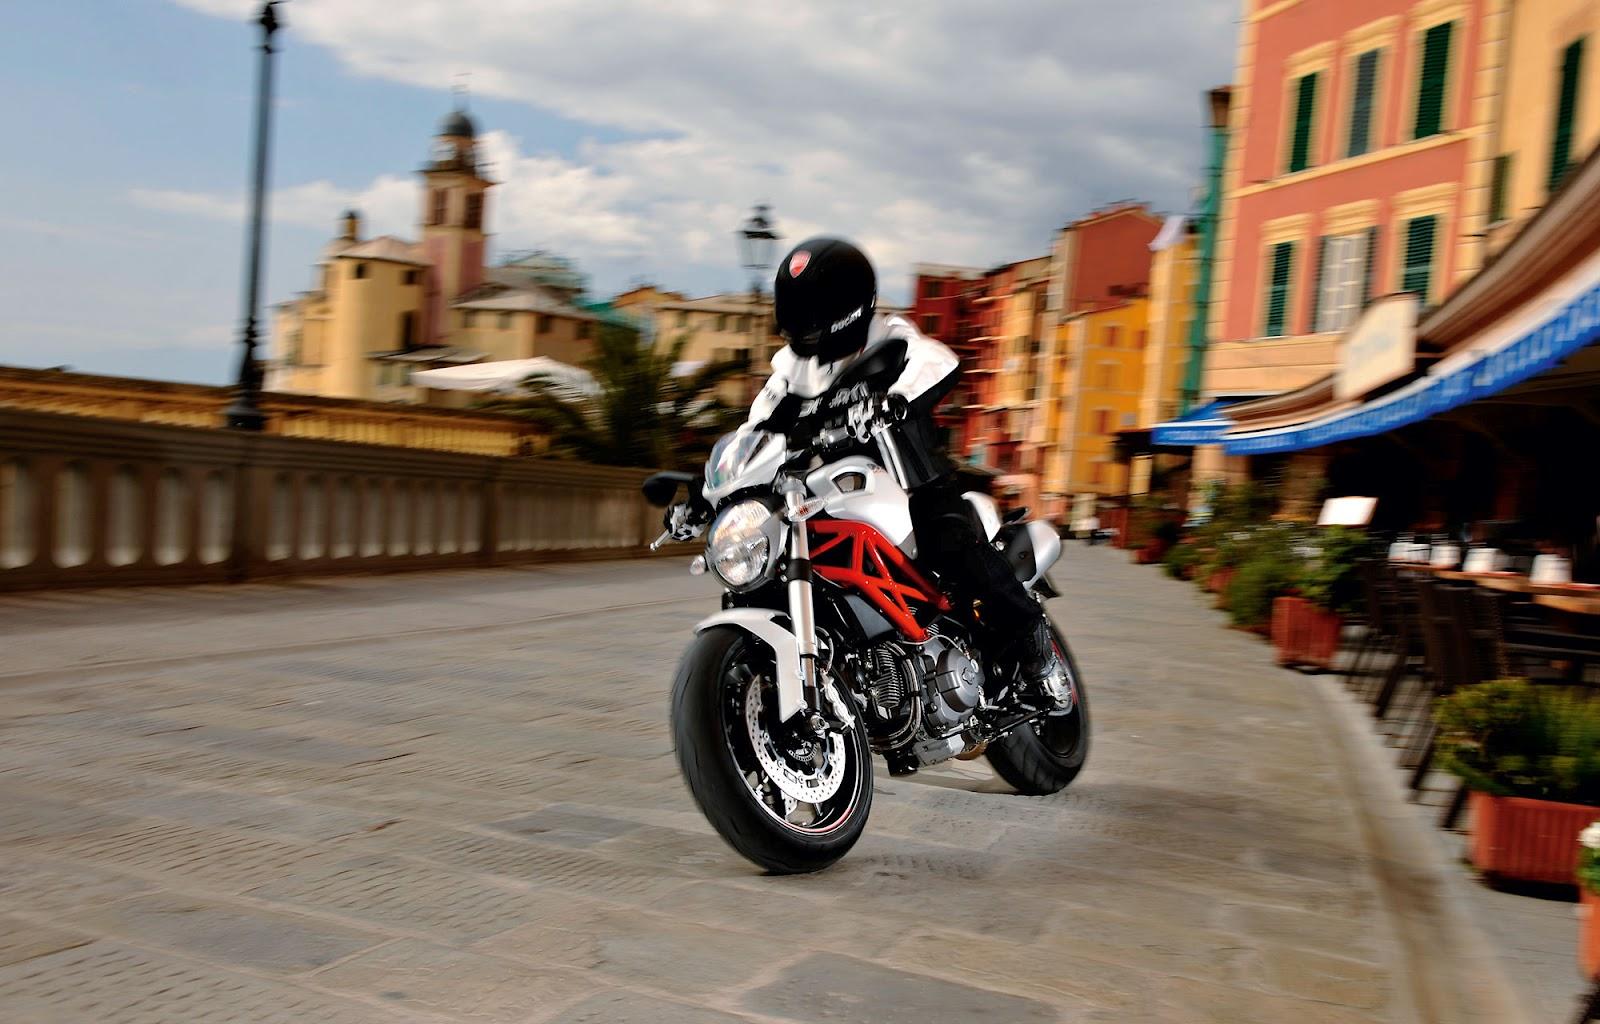 http://1.bp.blogspot.com/-bKltmB3Df70/T0o2Xhe9NJI/AAAAAAAABYs/0f-_ty46WBQ/s1600/2012+Ducati+Monster+796+-+7.jpg